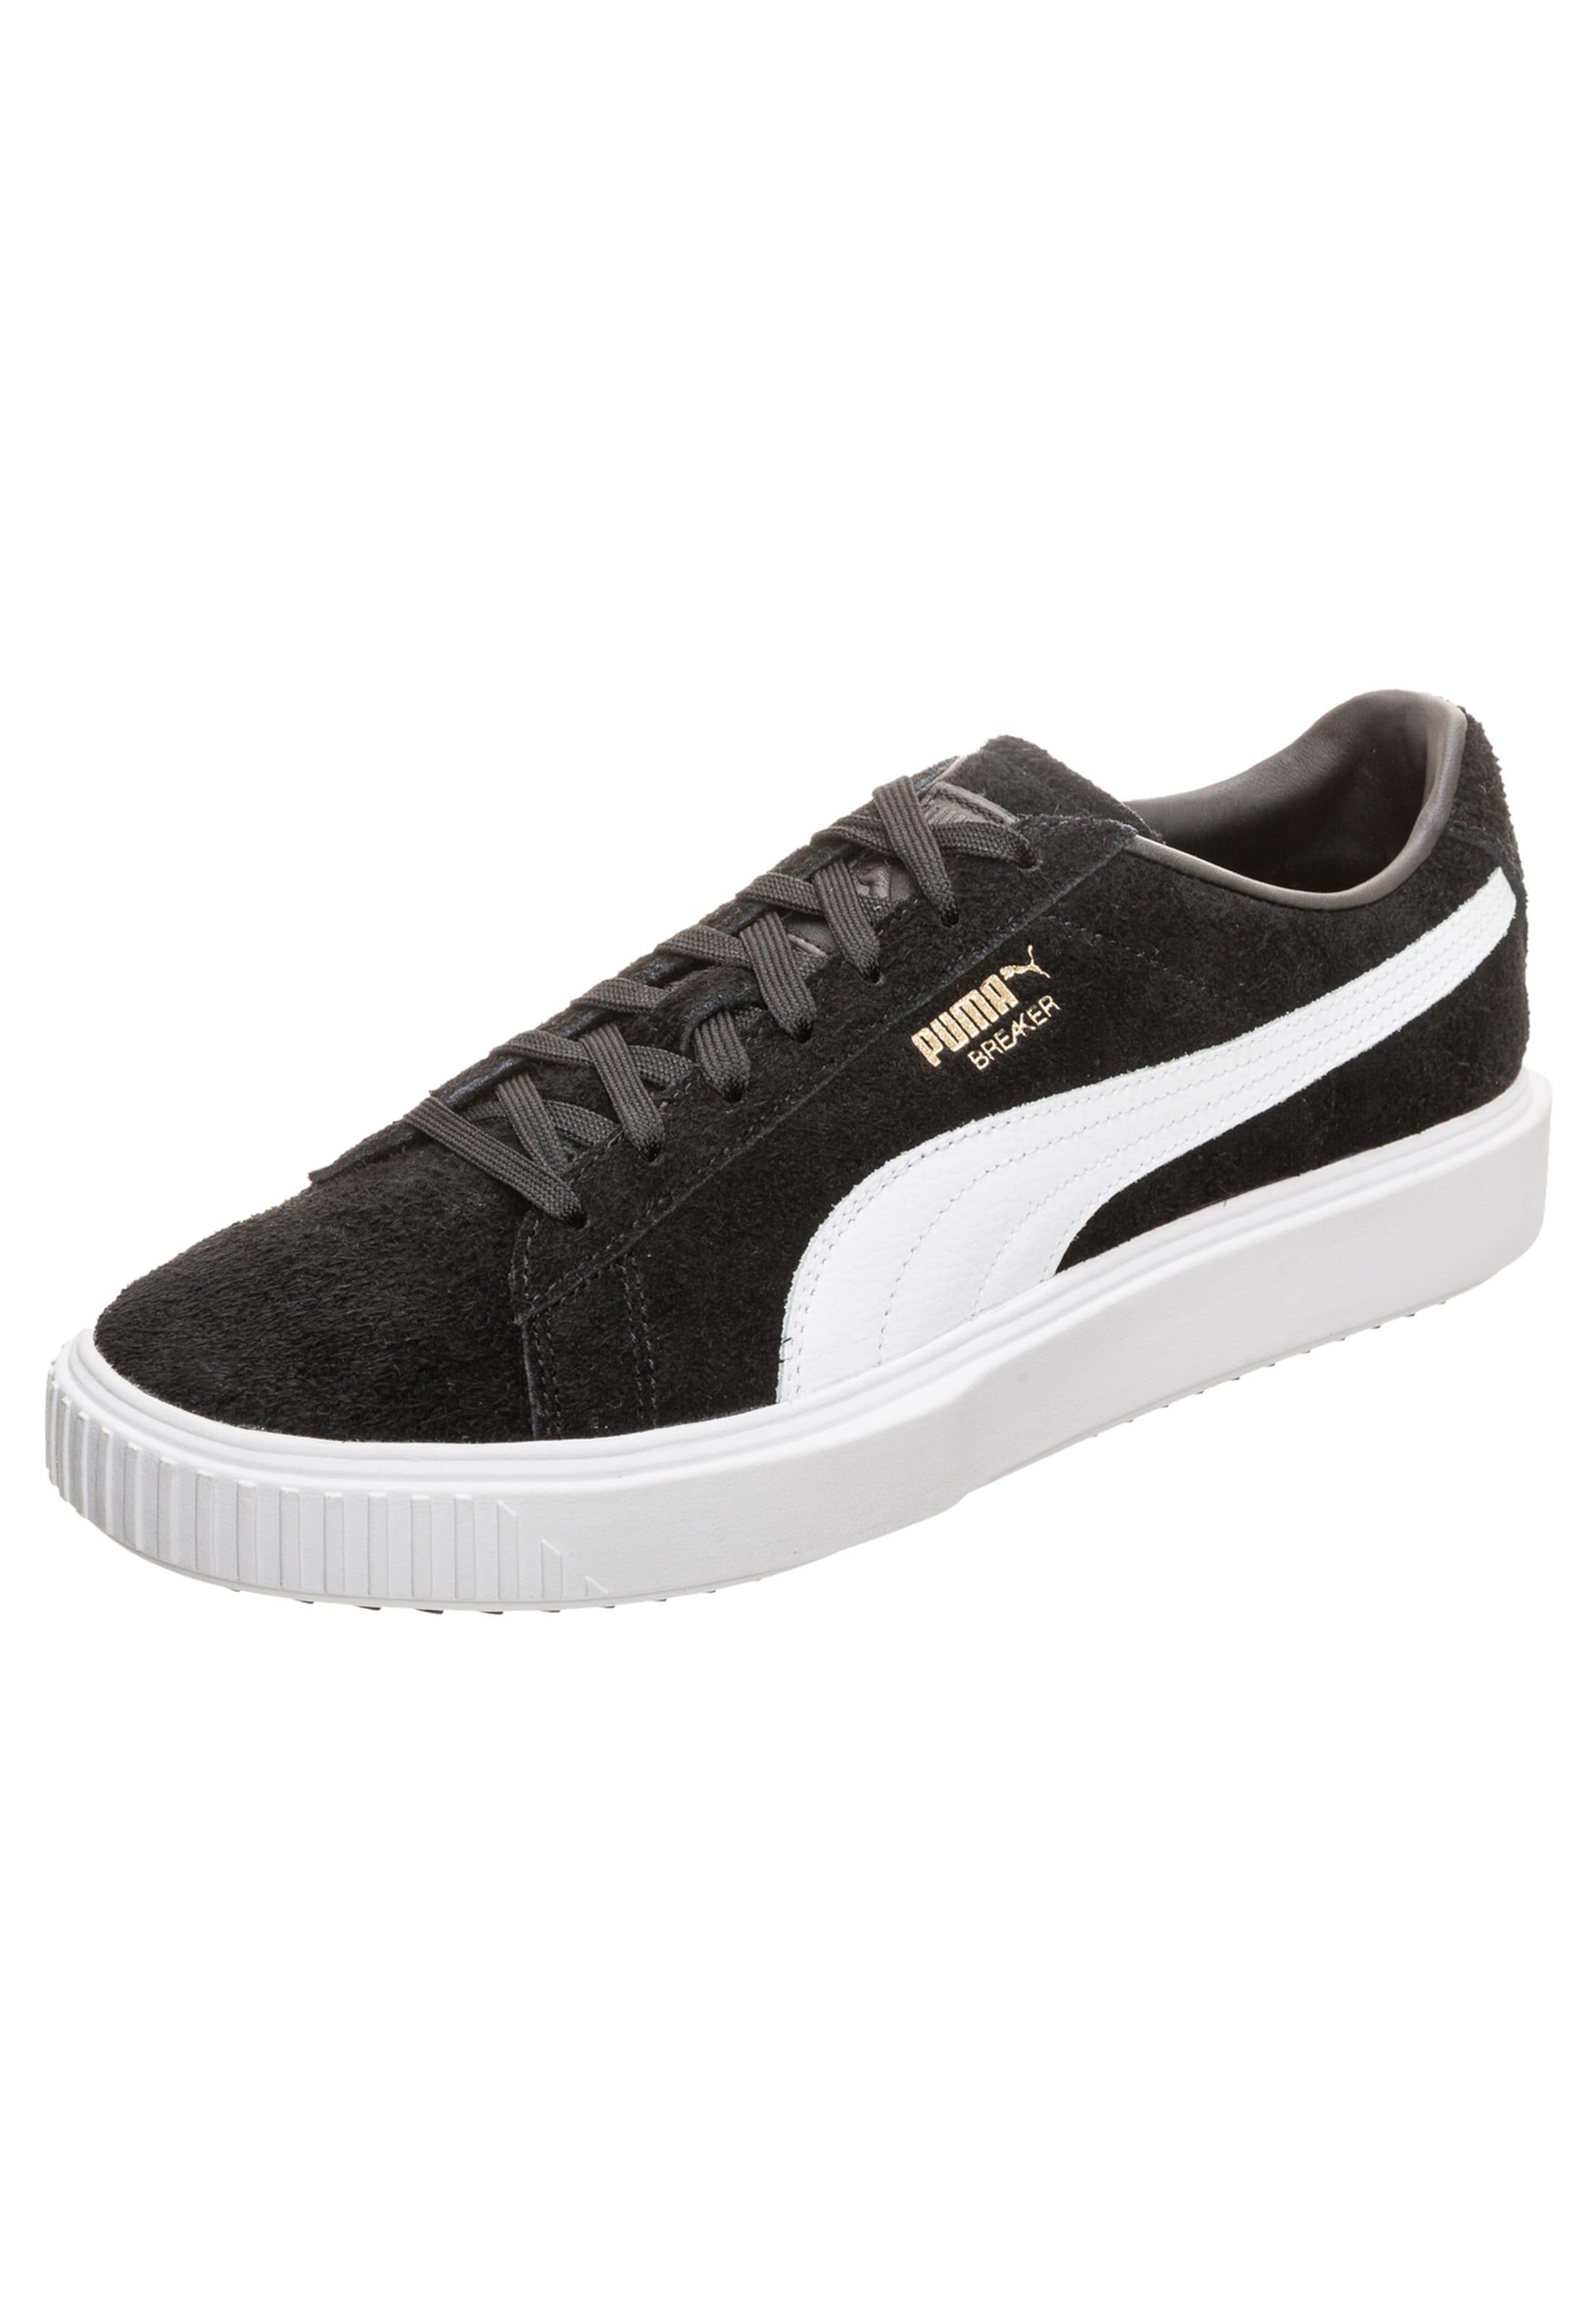 PUMA | | | Breaker Evolution Sneaker b08346